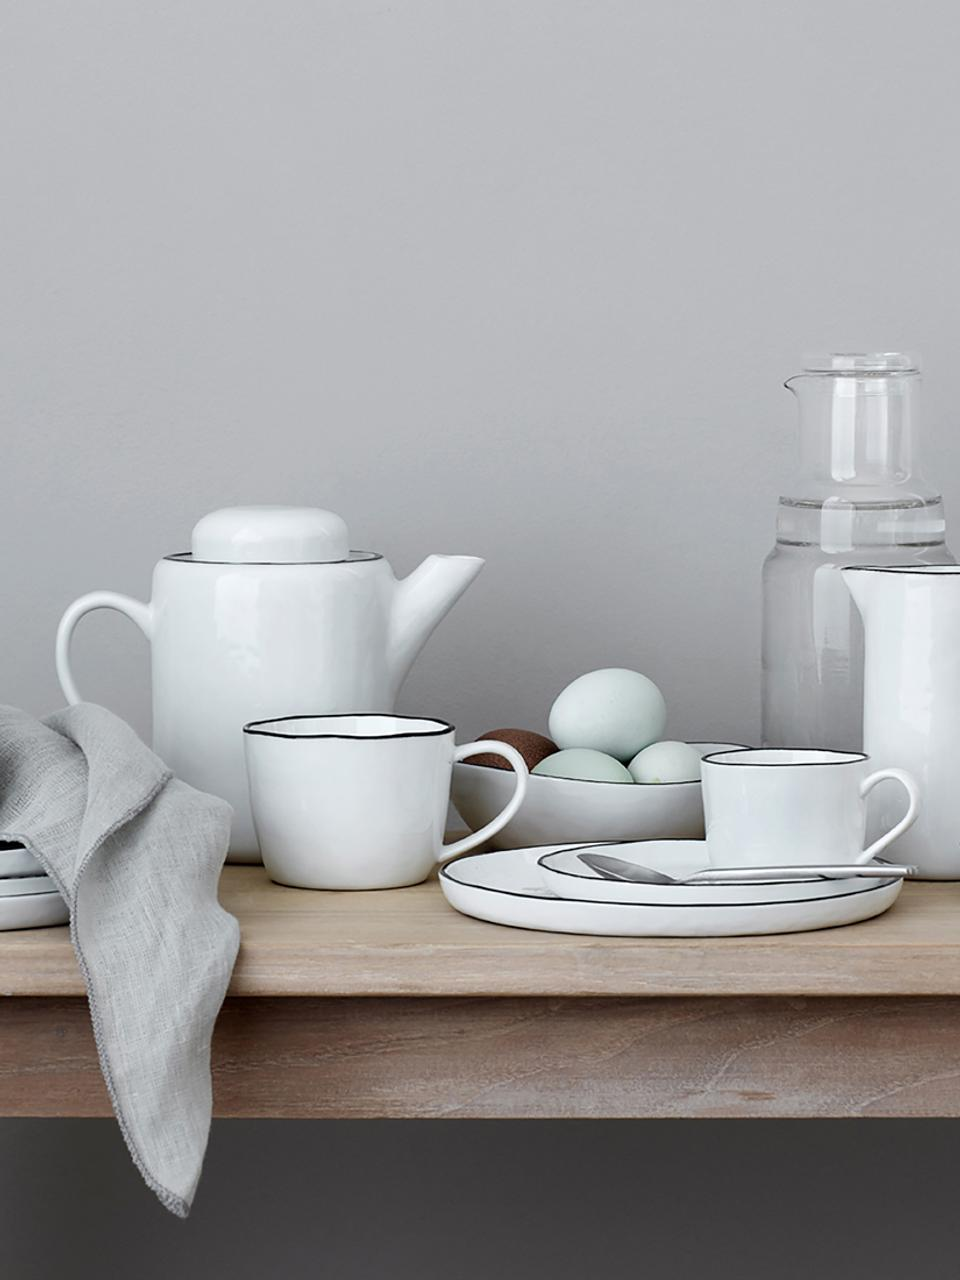 Tazzina caffè espresso fatta a mano Salt 2 pz, Porcellana, Bianco latteo, nero, Ø 6 x Alt. 5 cm